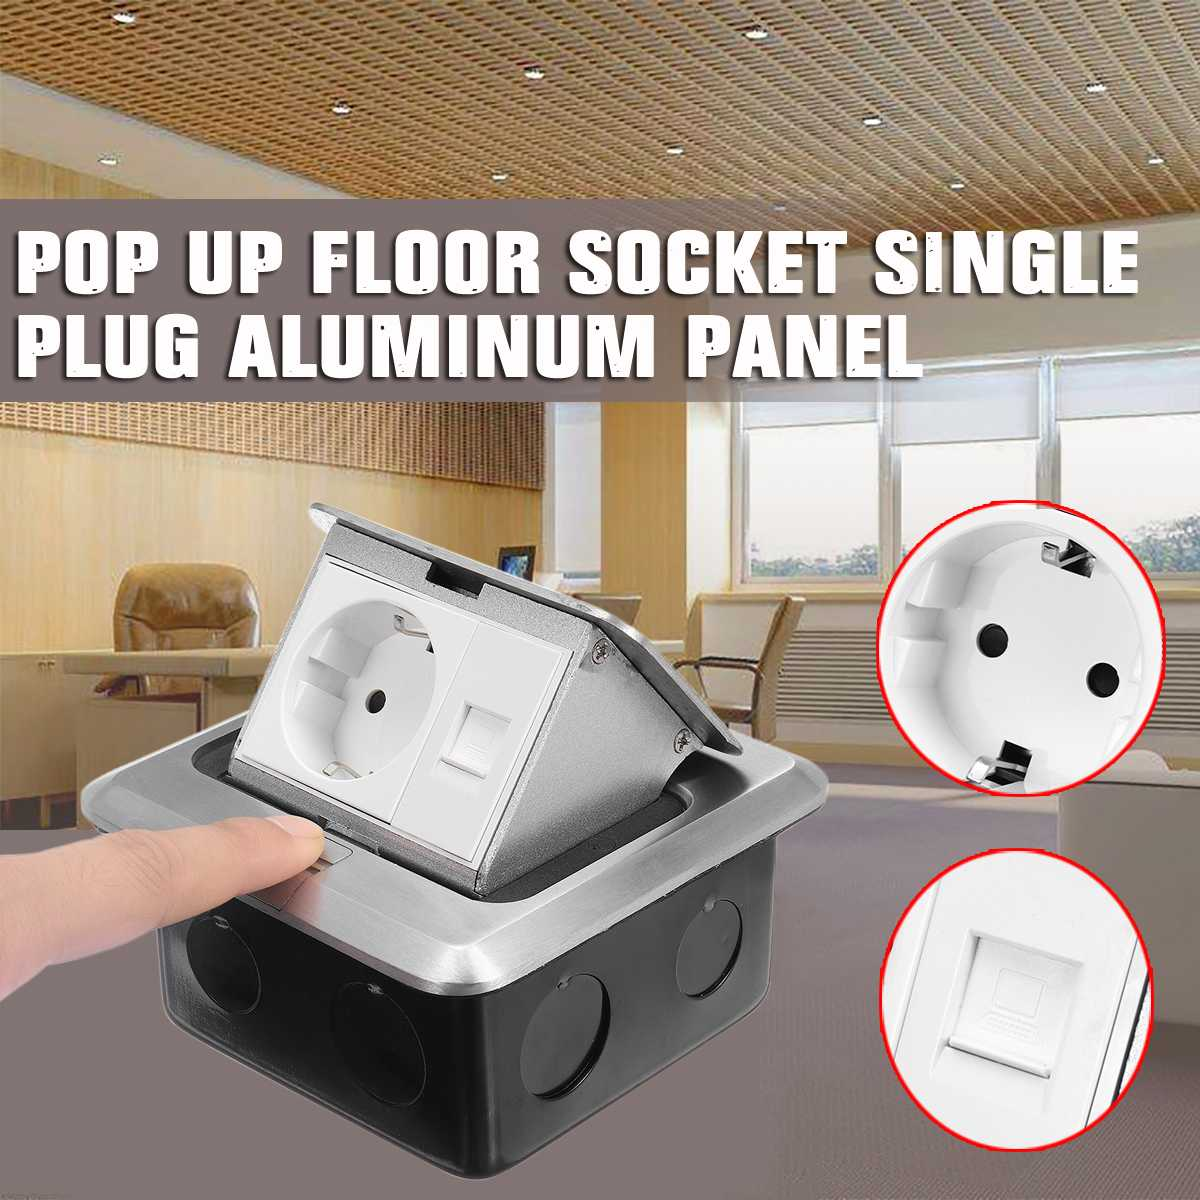 SWILET Aluminum Silver Panel Pop-Up EU Standard Socket + Universal Floor Socket Power Outlet Meeting Room Hotel Steel Box Outlet